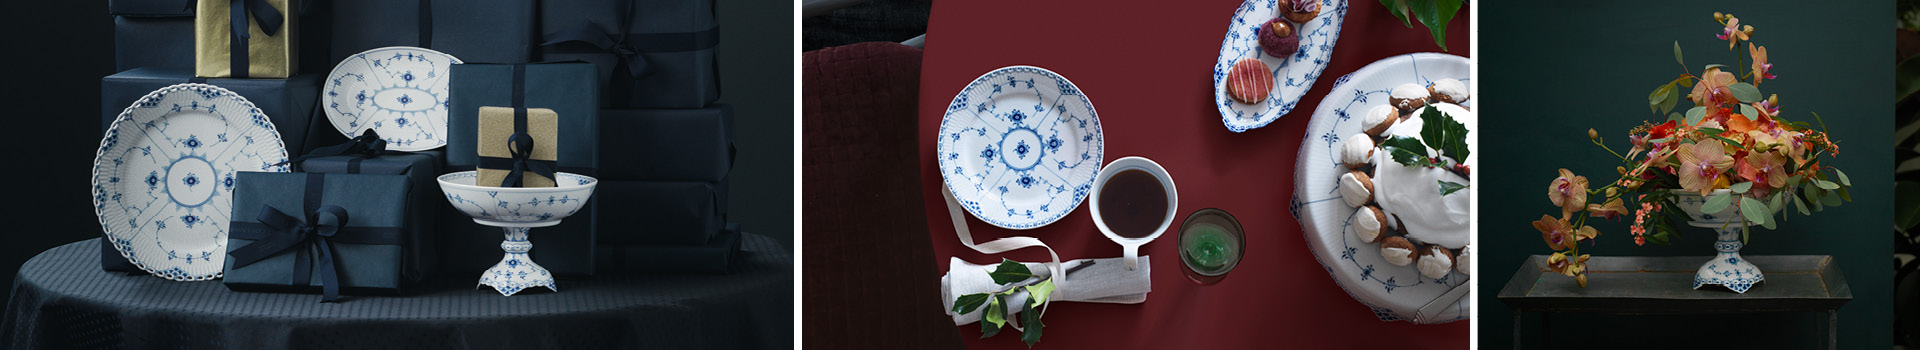 Royal-Copenhagen-Blue-Fluted-halflace-Musselmalt-Riflet-halvblonde-d.jpg